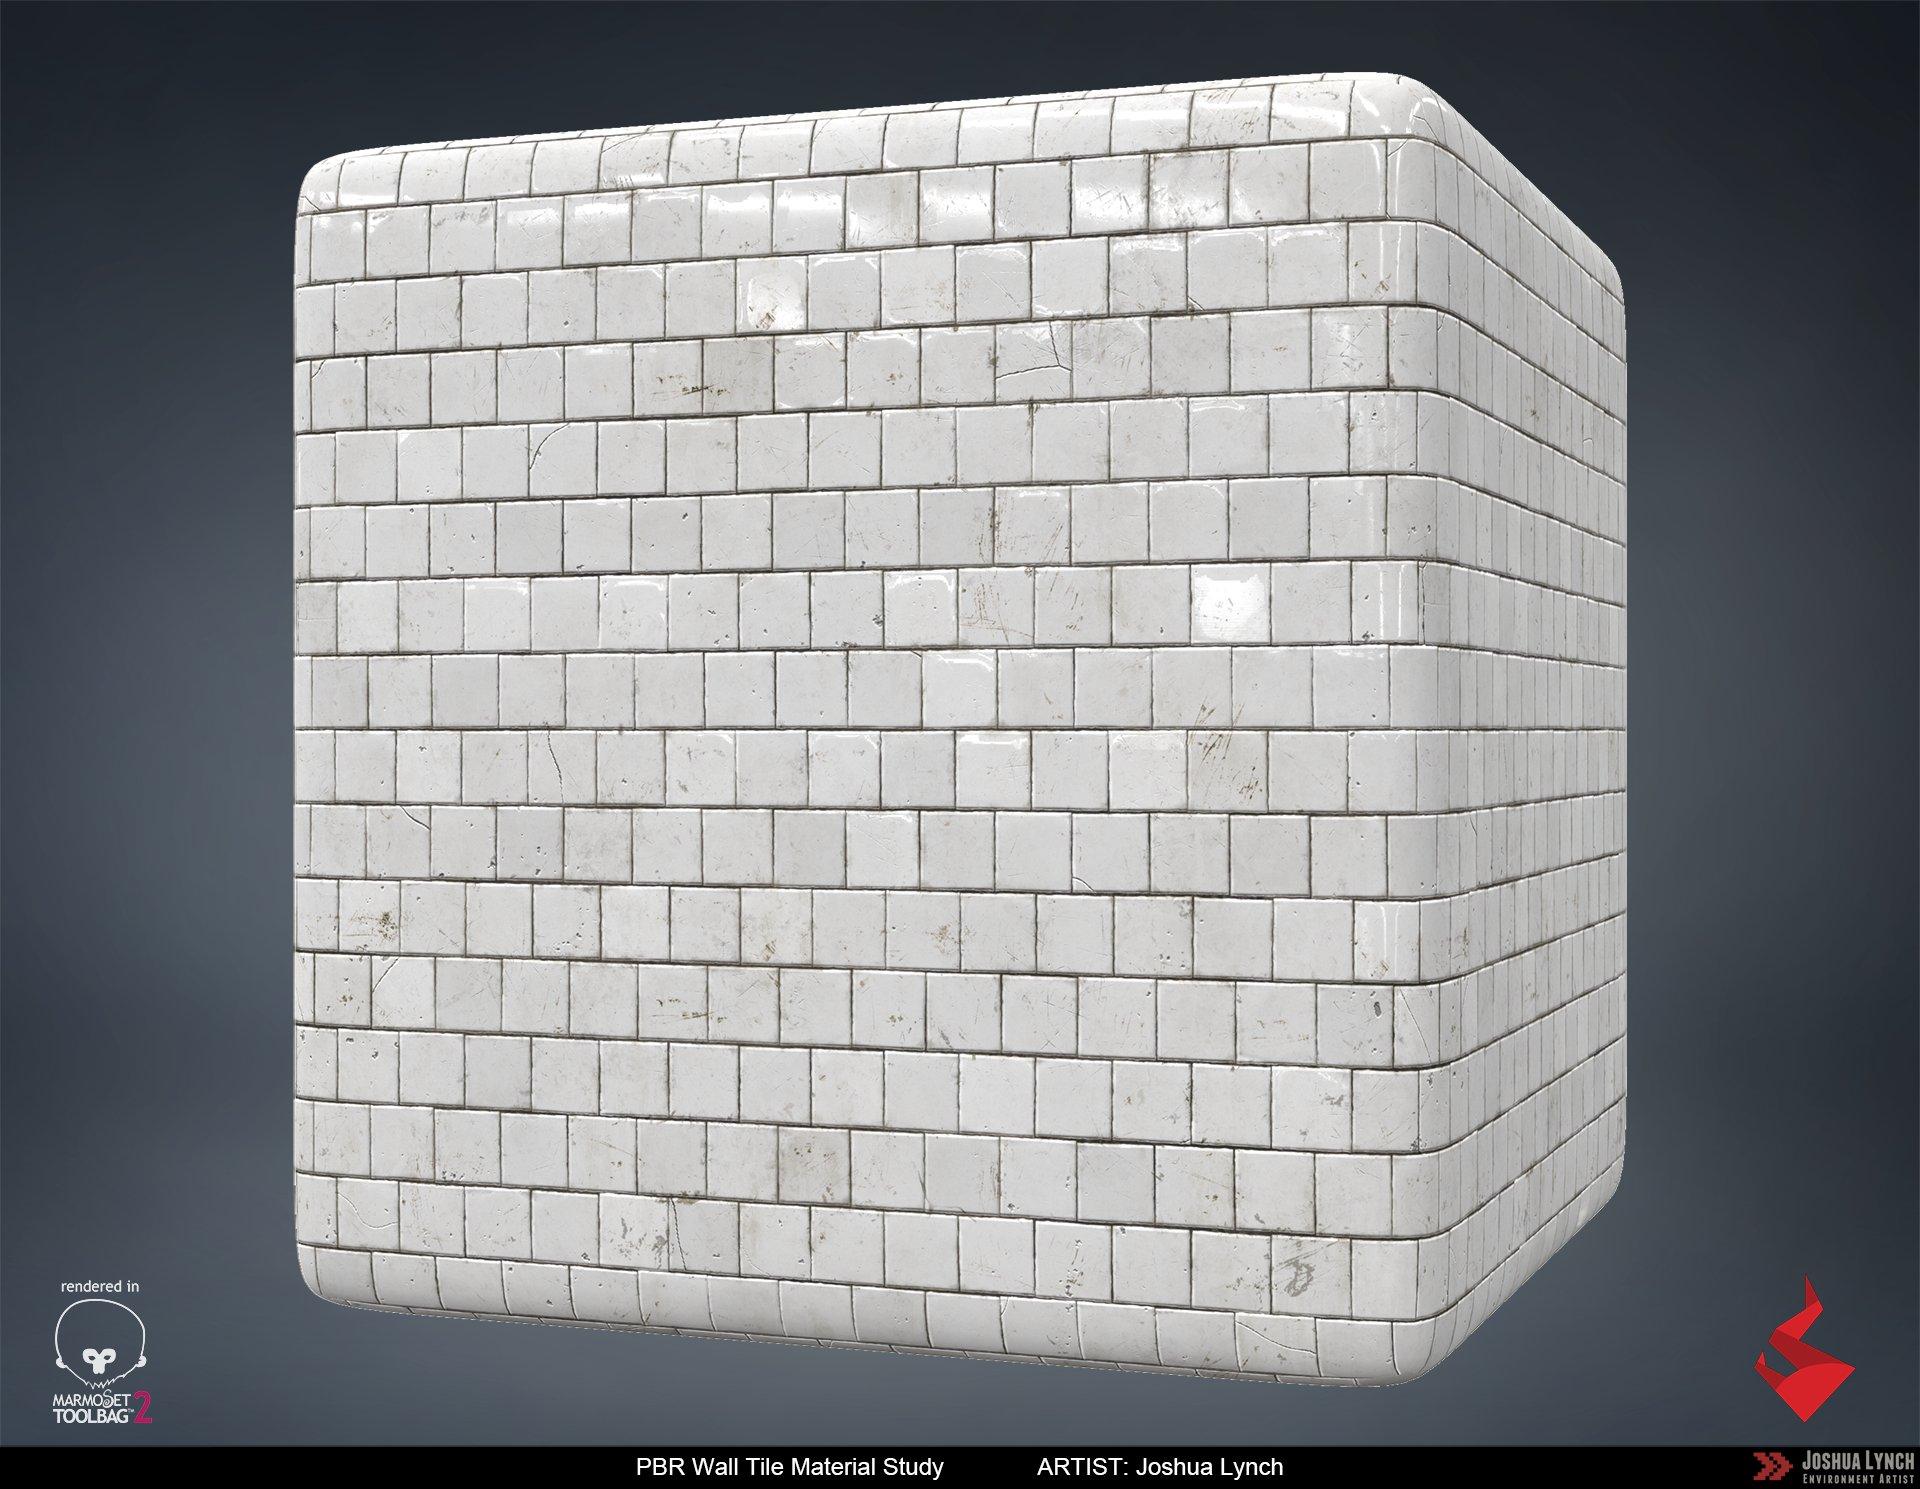 Joshua lynch subway wall tile small rev 06 layout comp josh lynch